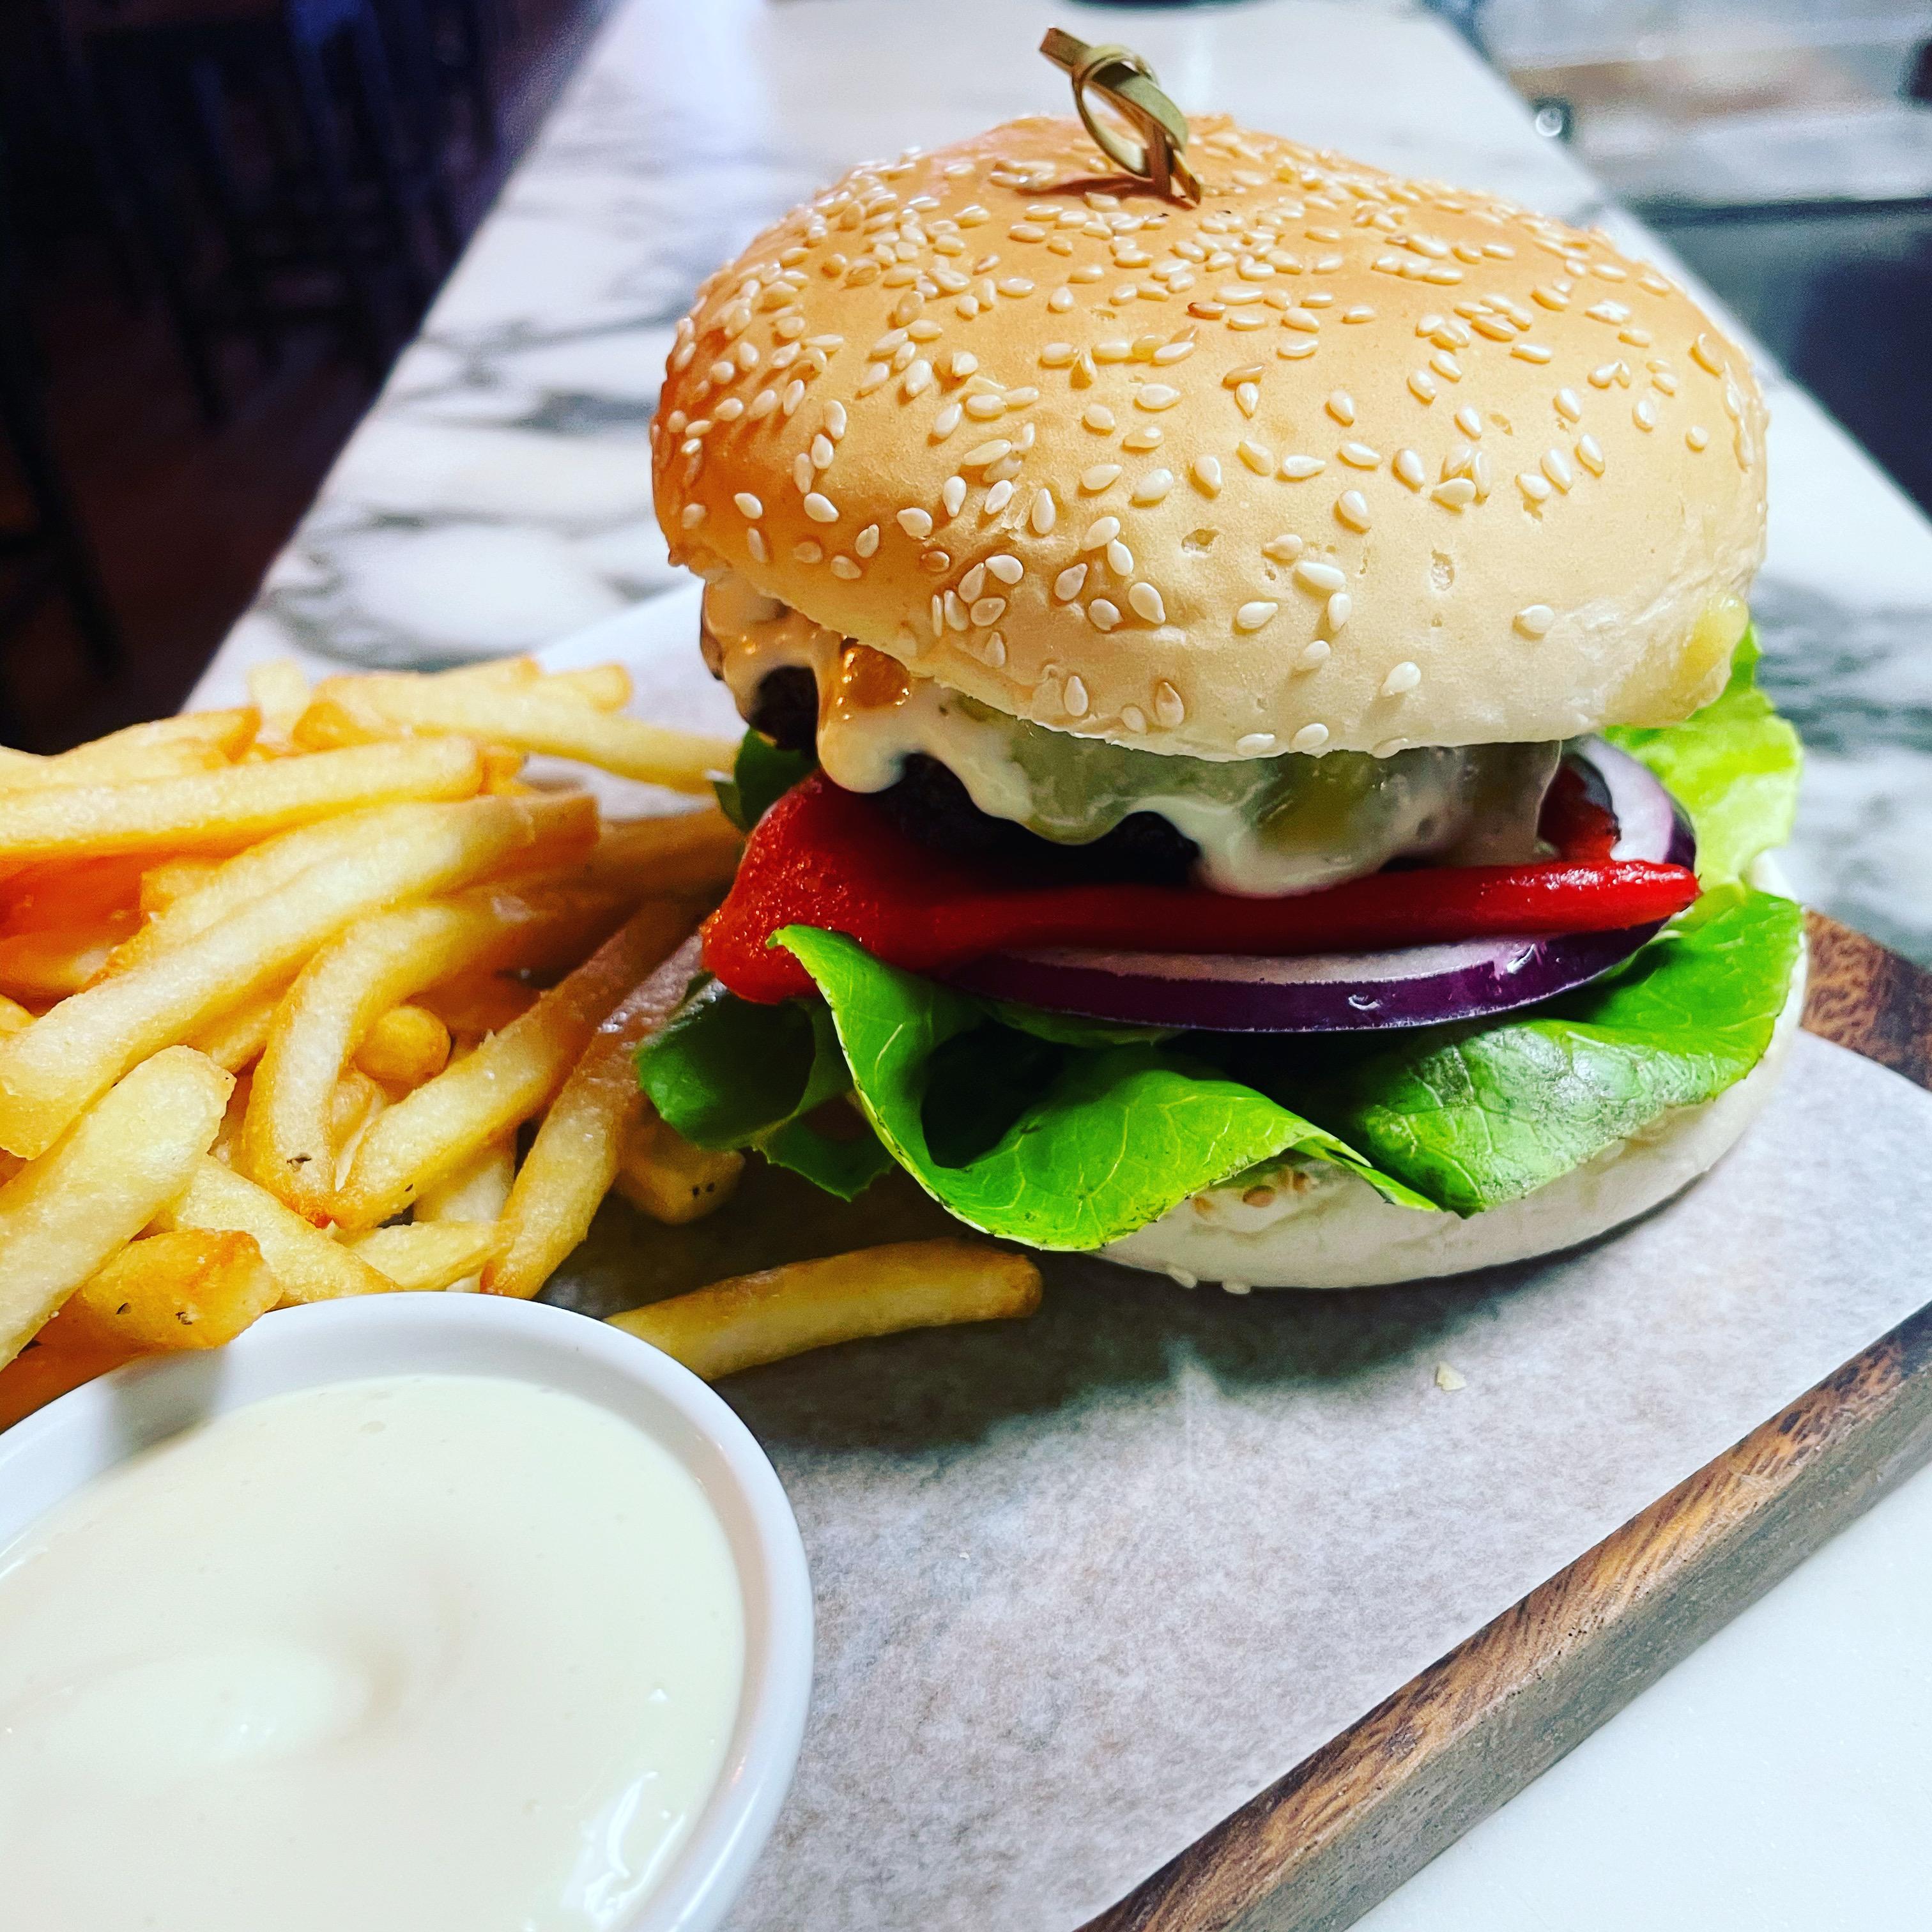 Beef Burger & fries